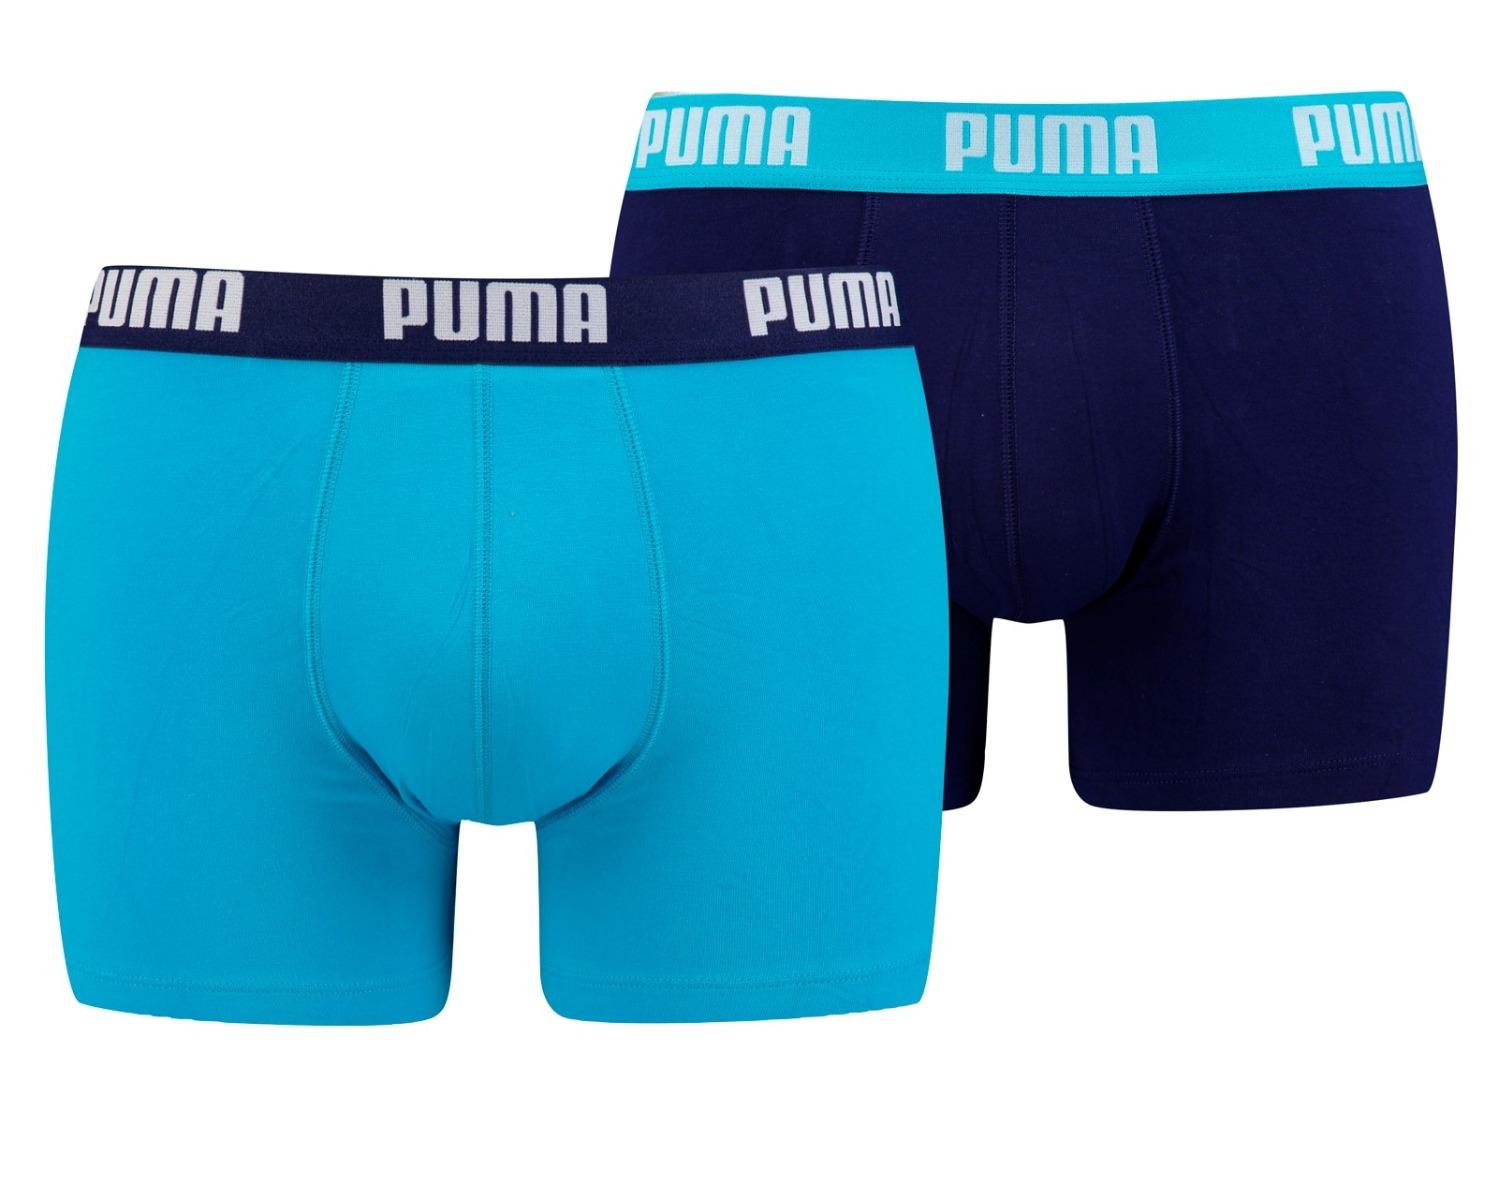 PUMA BASIC BOXER 2P AQUA - BLUE-L